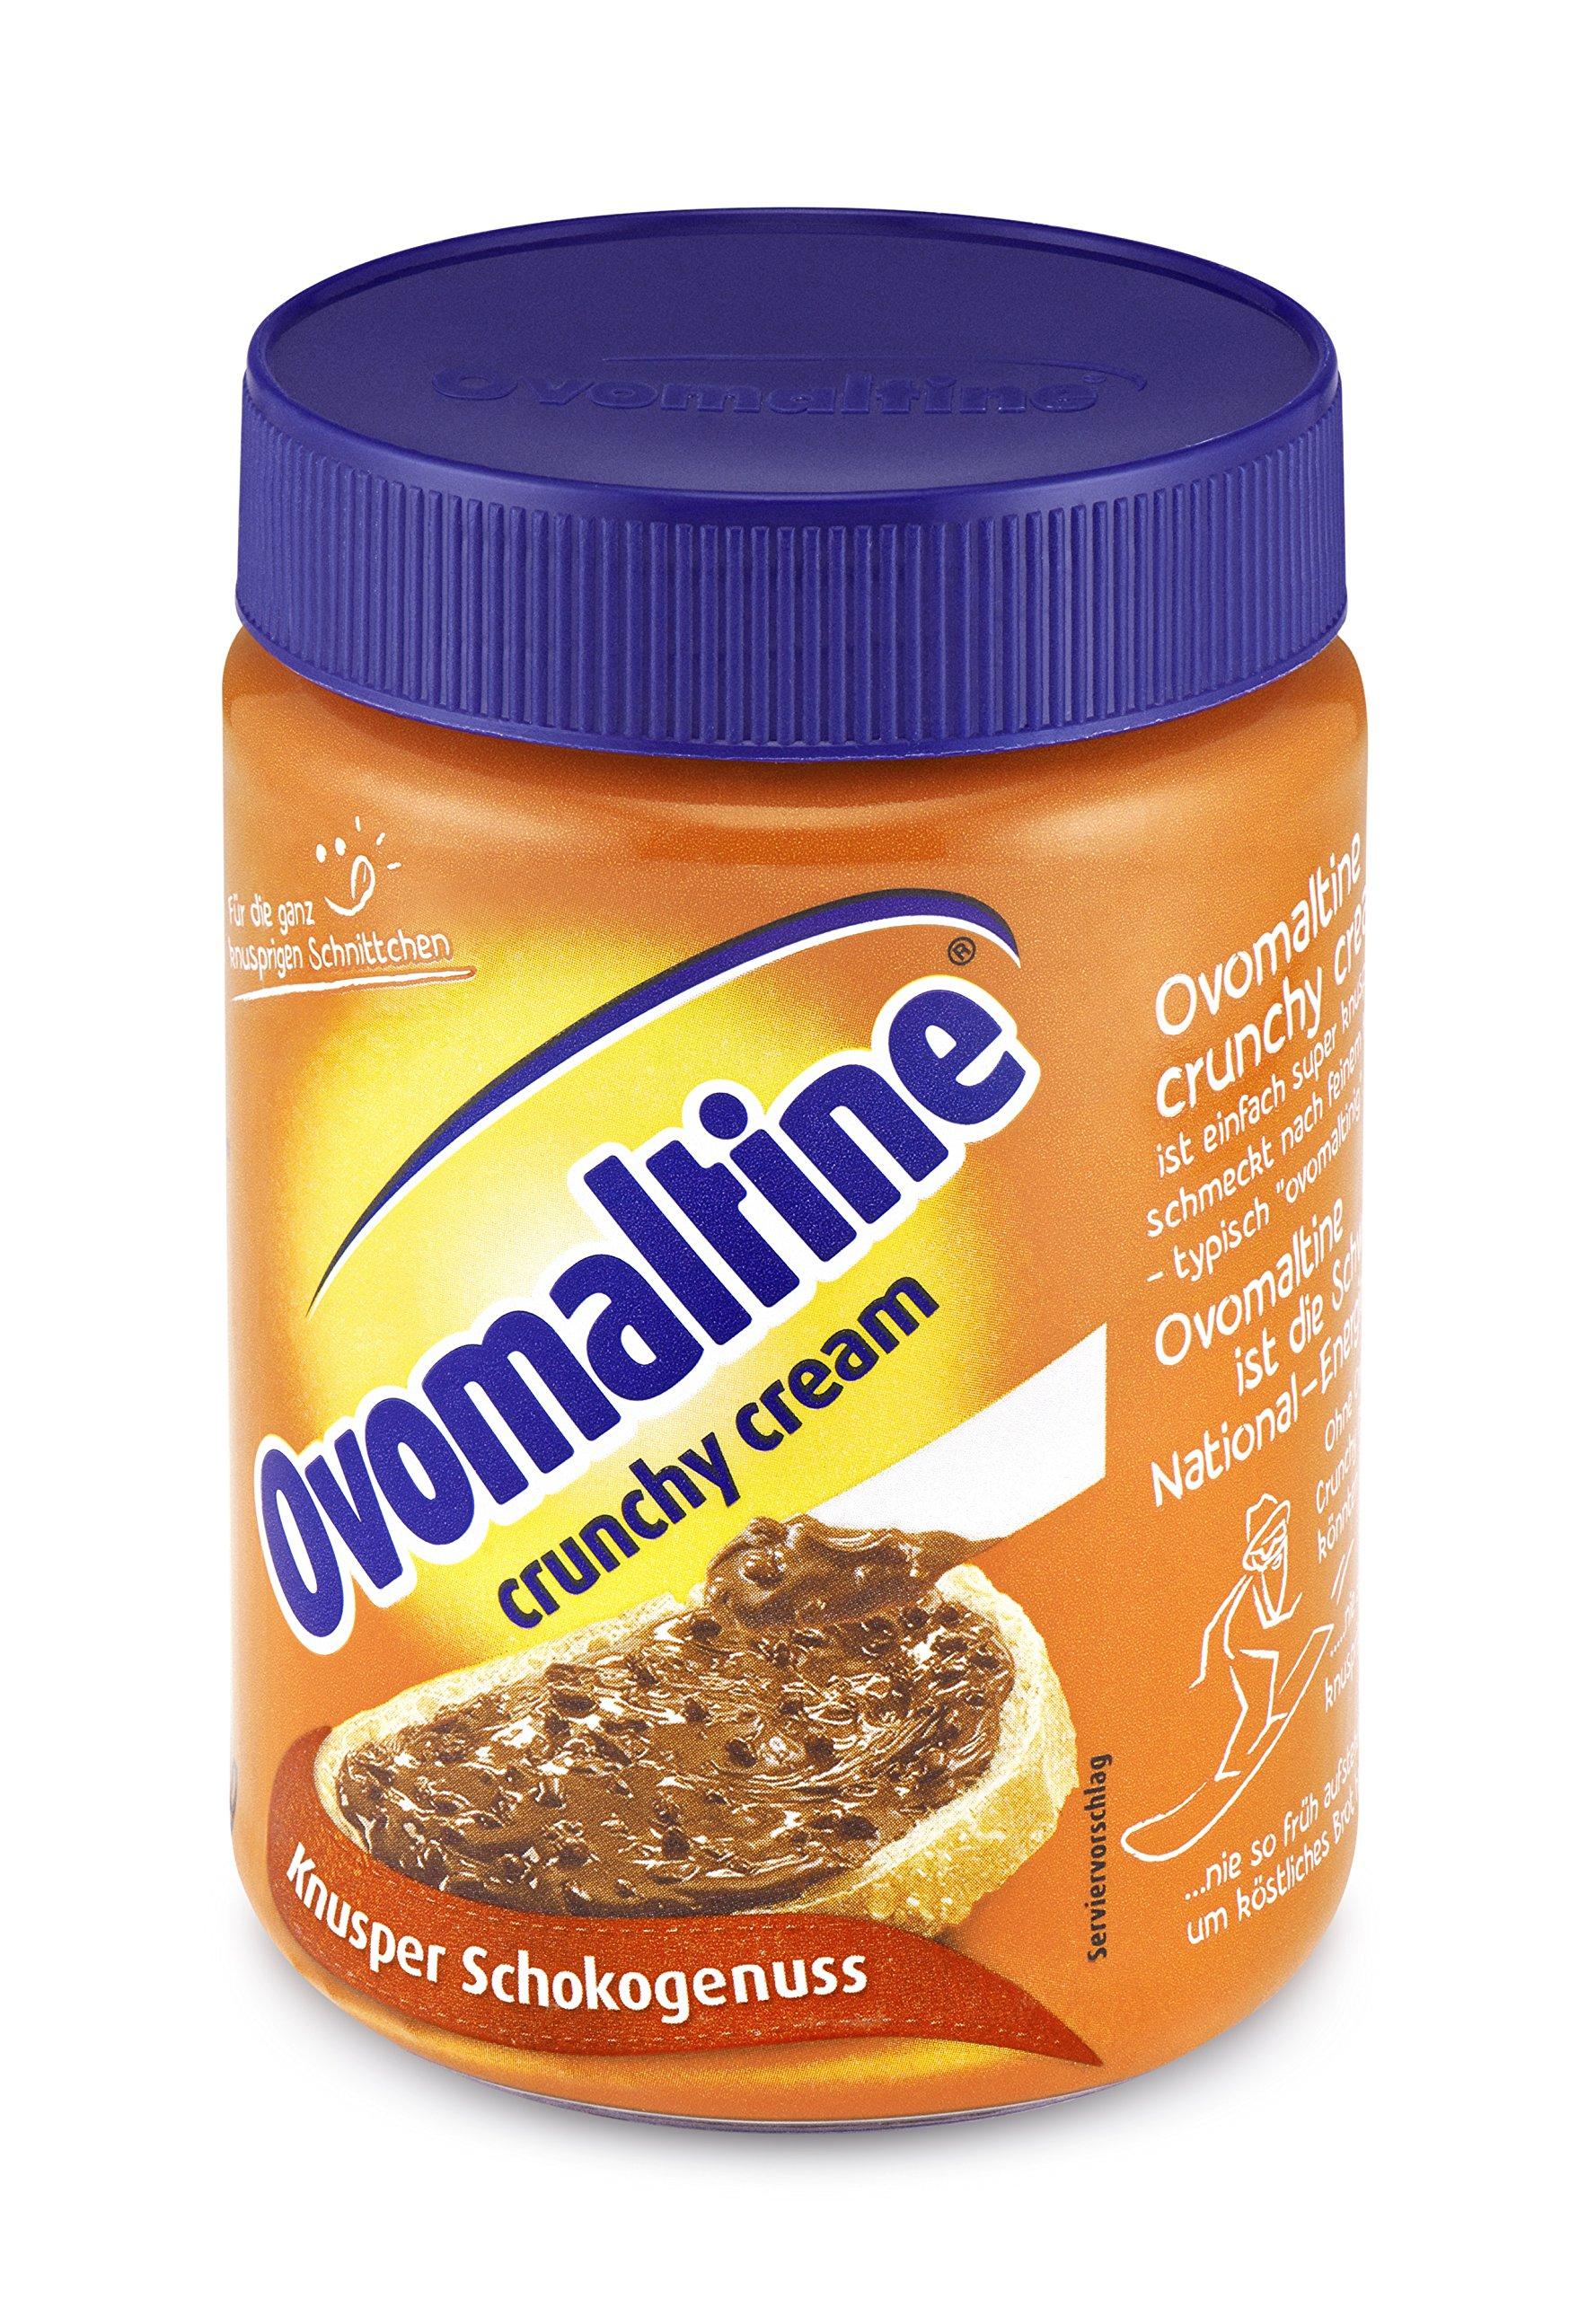 5 Ovomaltine Crunchy Cream Spread 400 Gram 3 Pcs